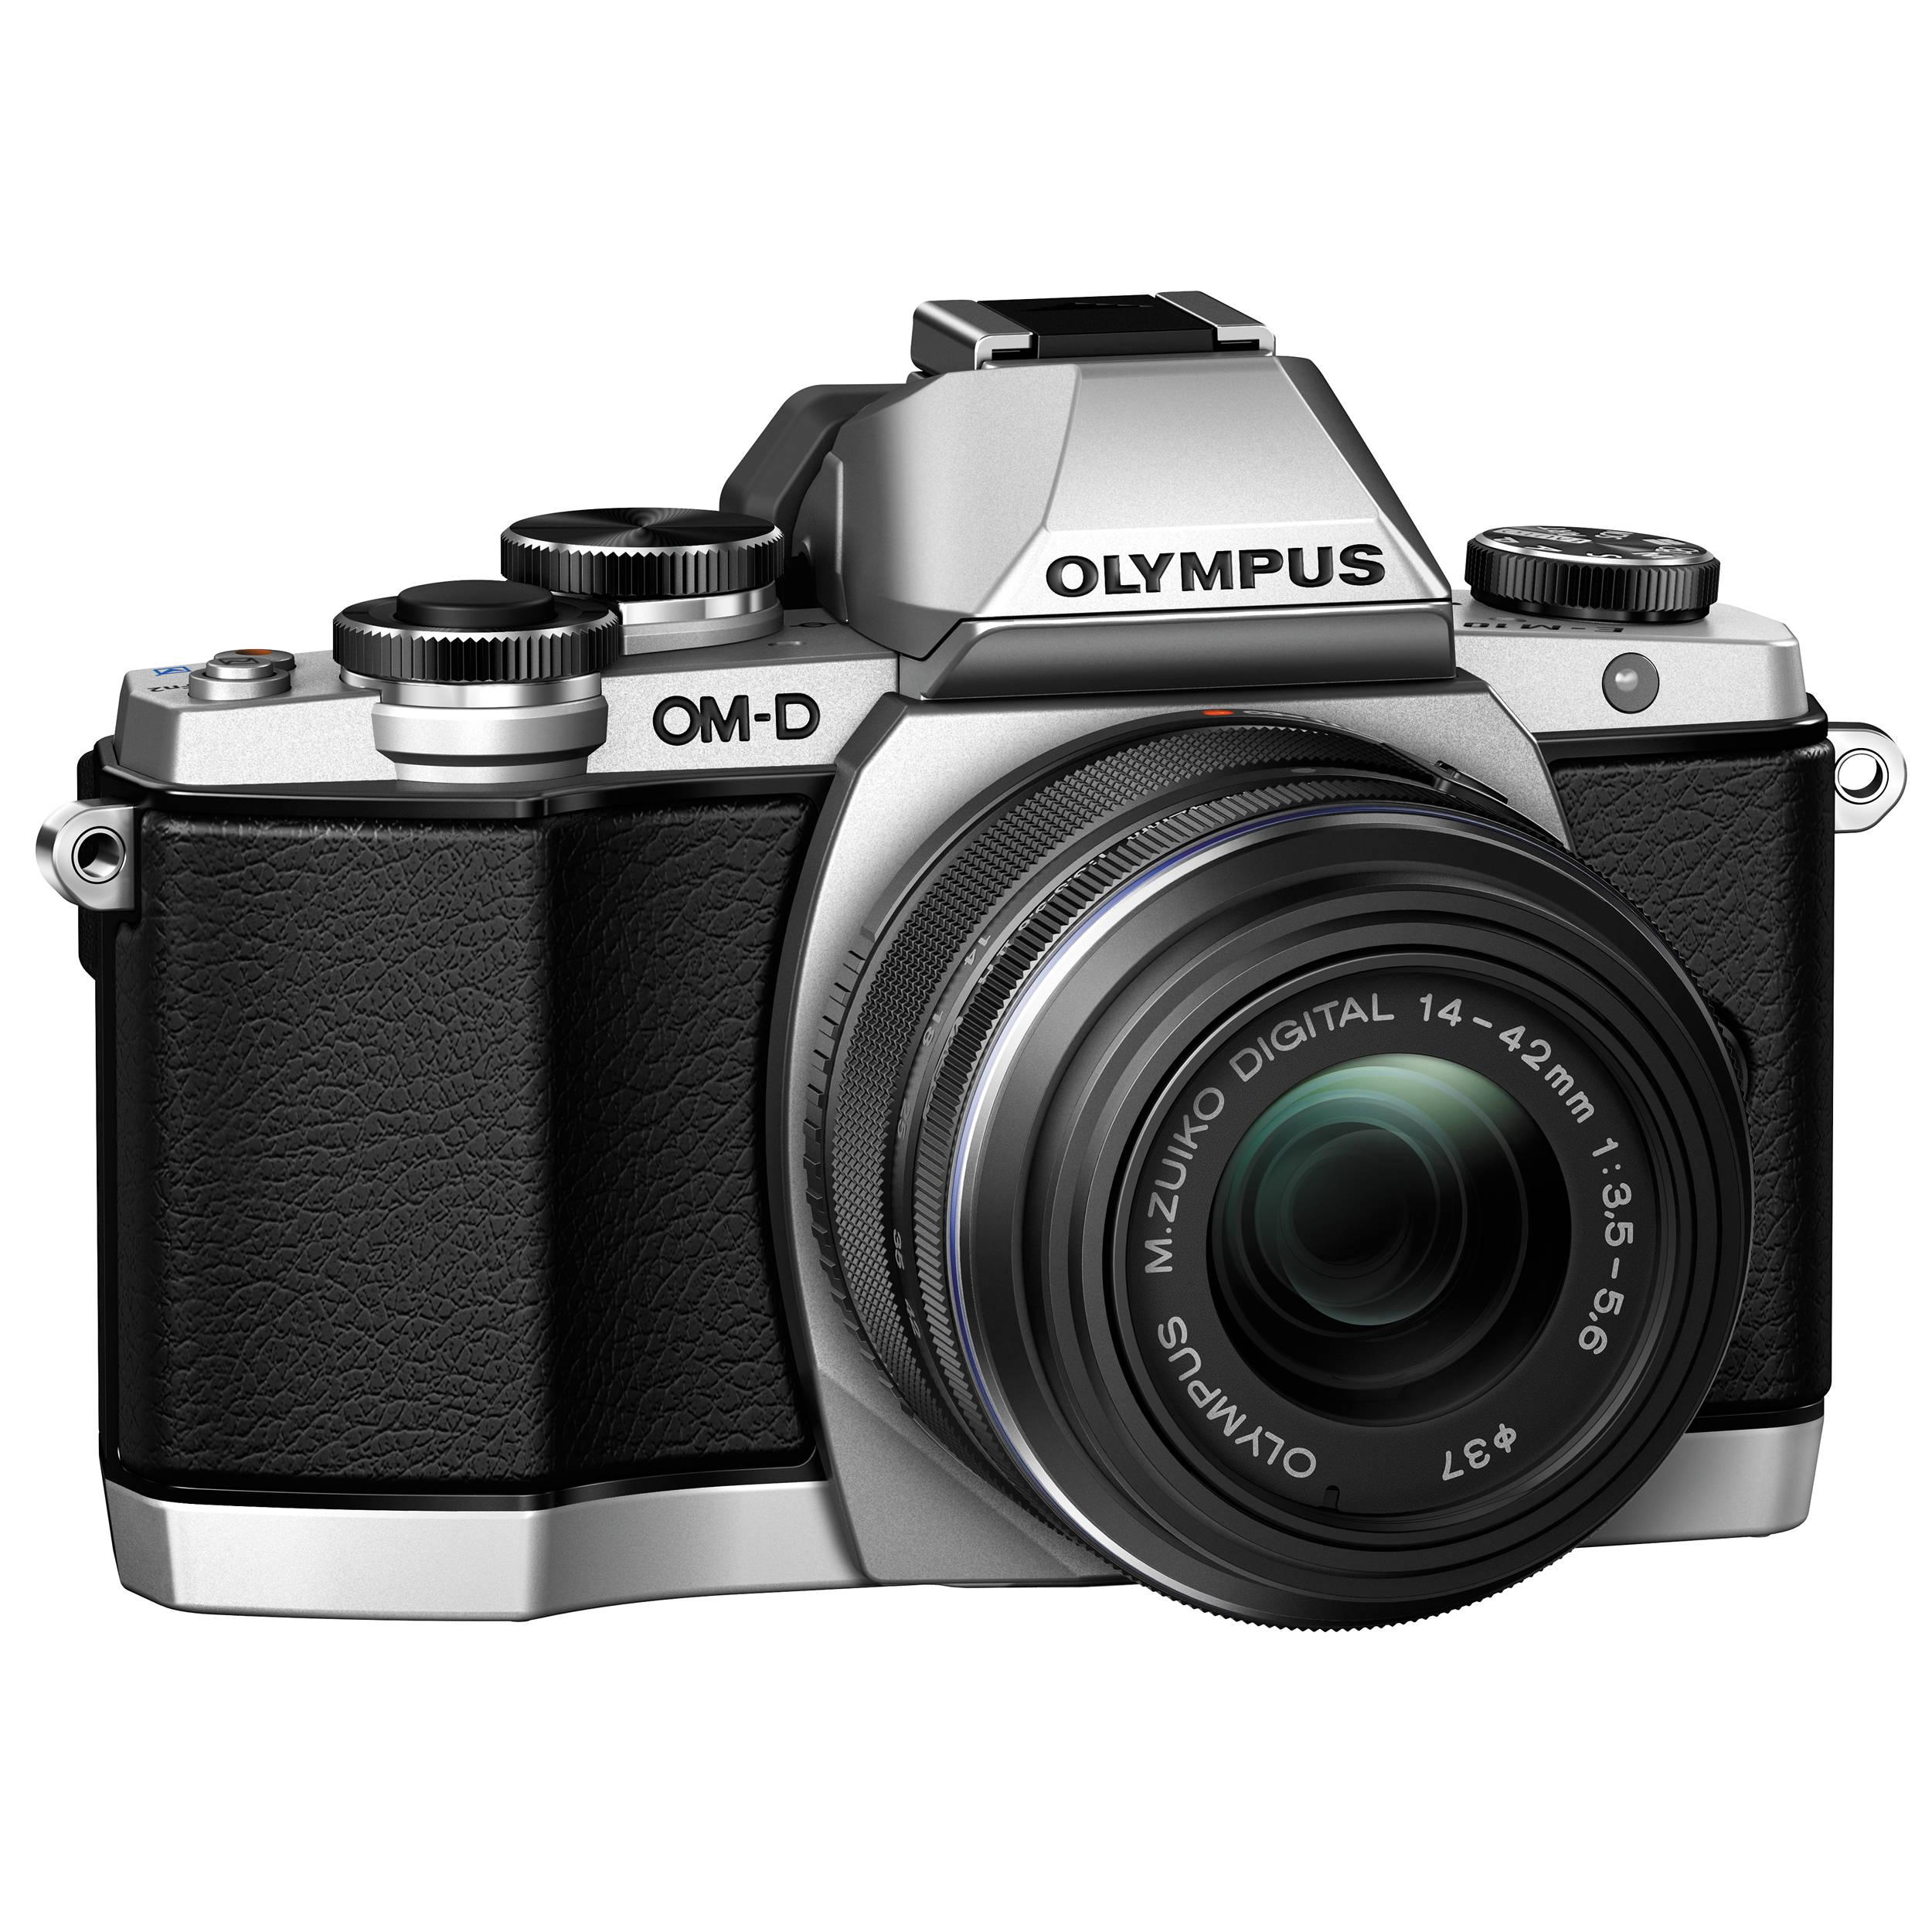 Photo Olympus Camera Olympus Om-d E-m10 Mirrorless